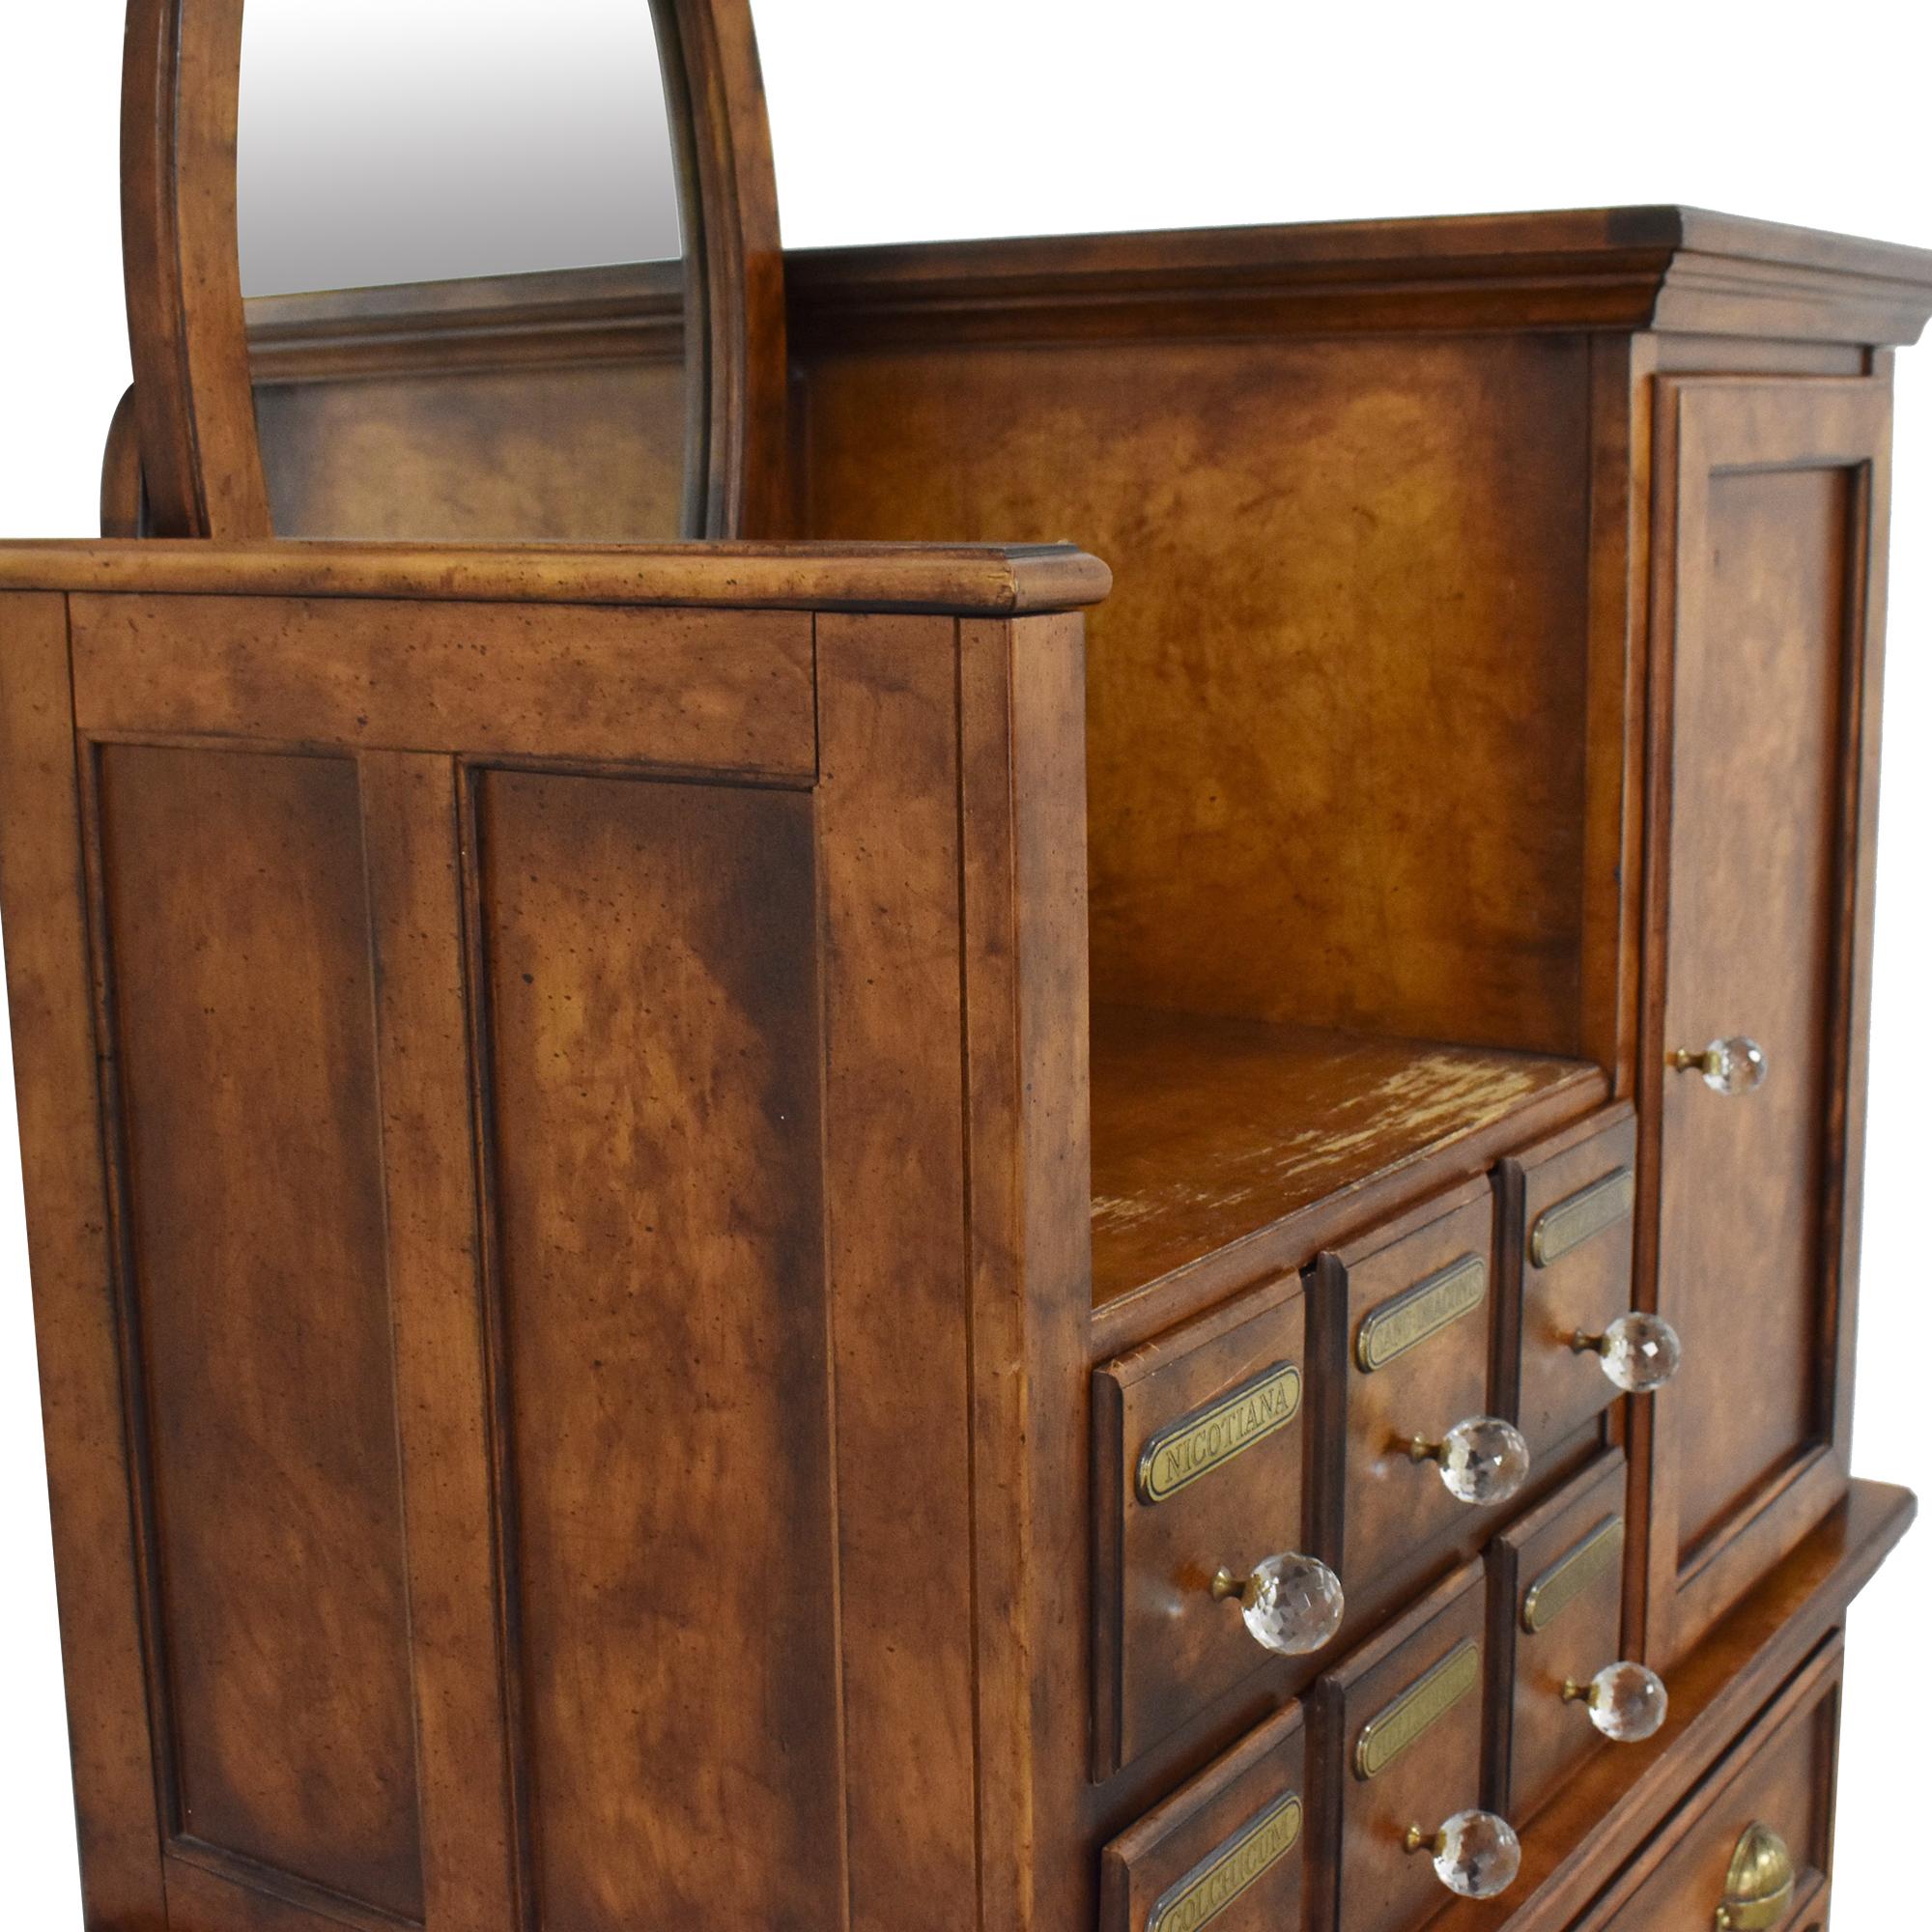 Antique Apothecary Wardrobe with Mirror nj